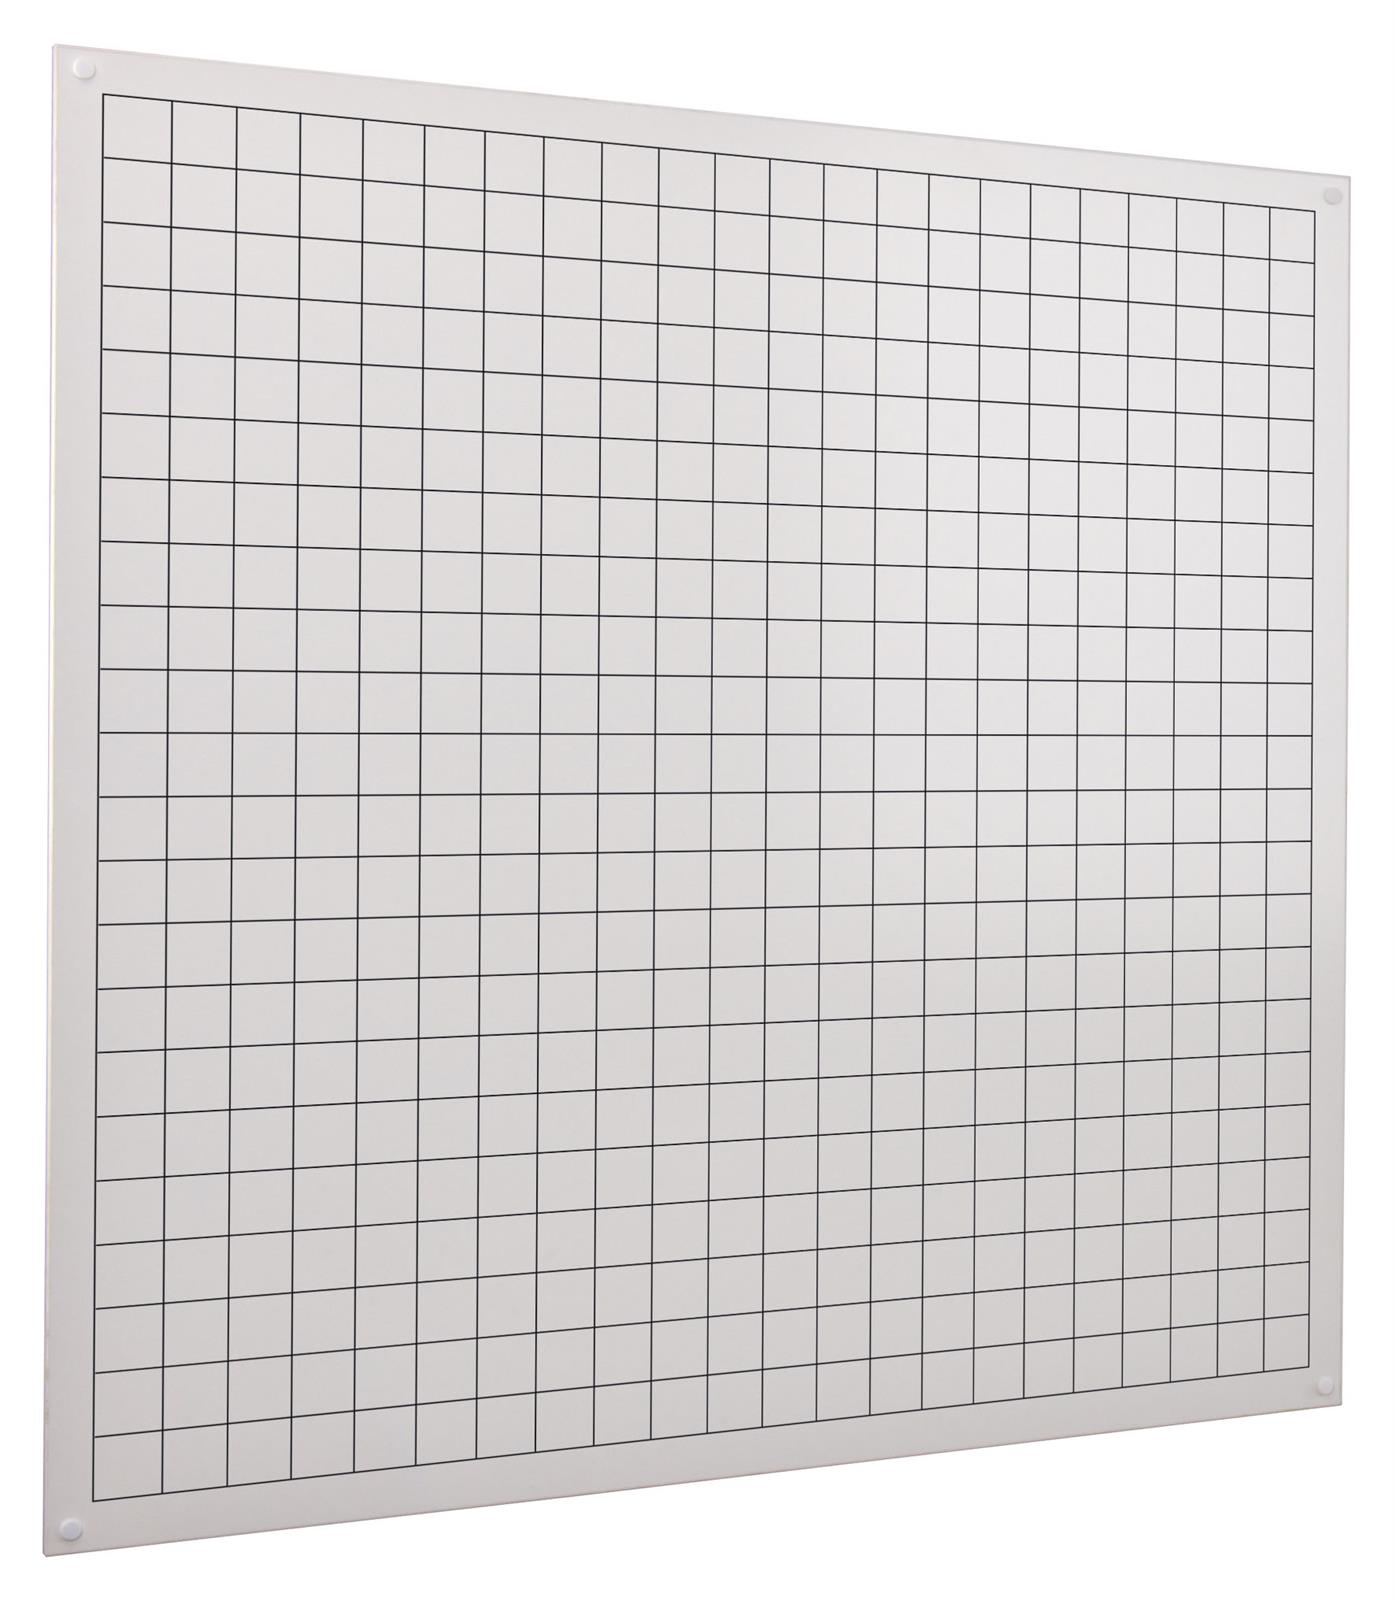 WriteOn Printed Modular Whiteboards